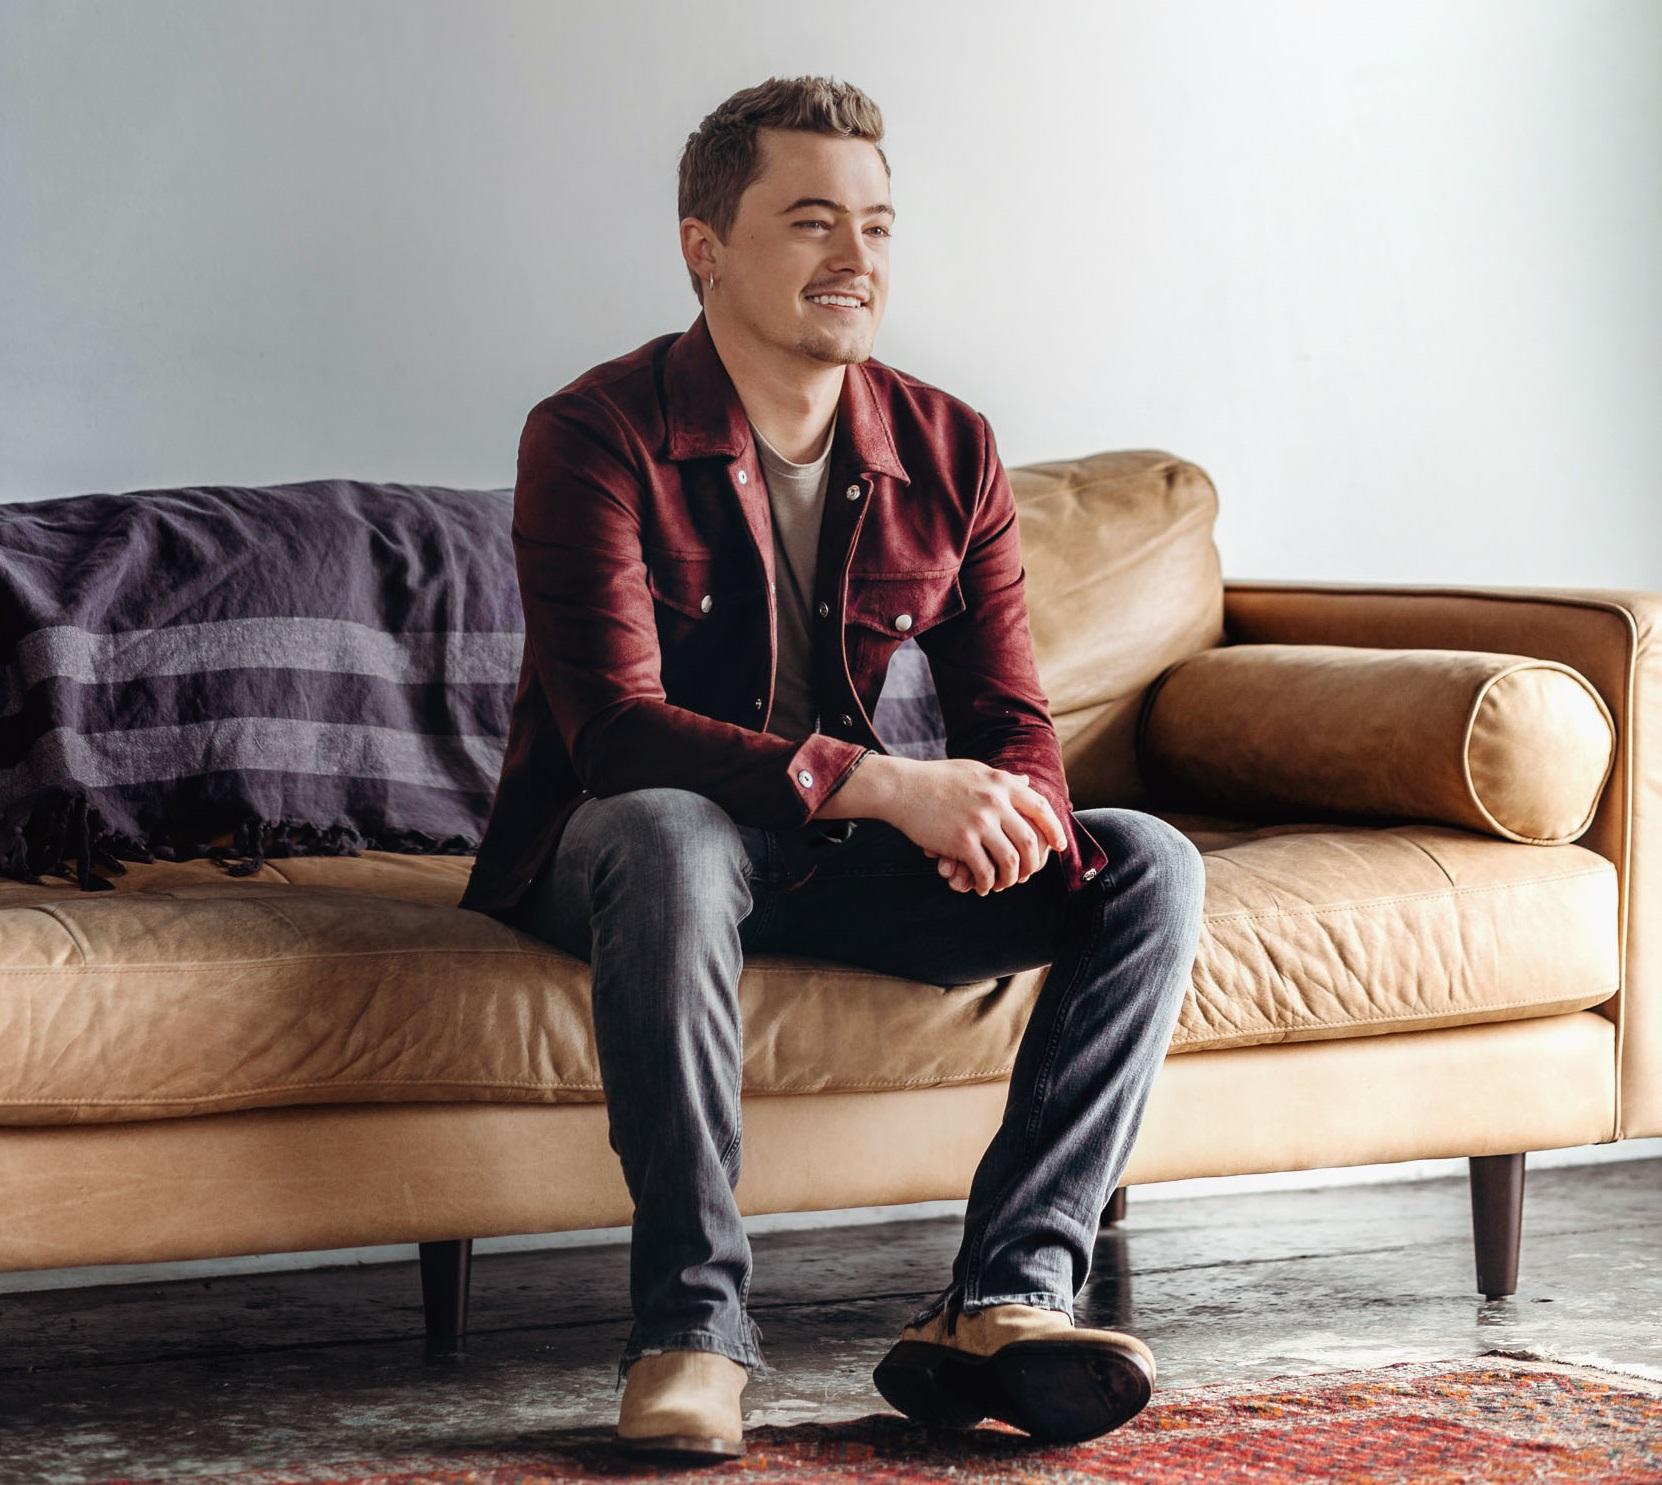 Jordan Rager Finds Inspiration in Tim McGraw and Jason Aldean